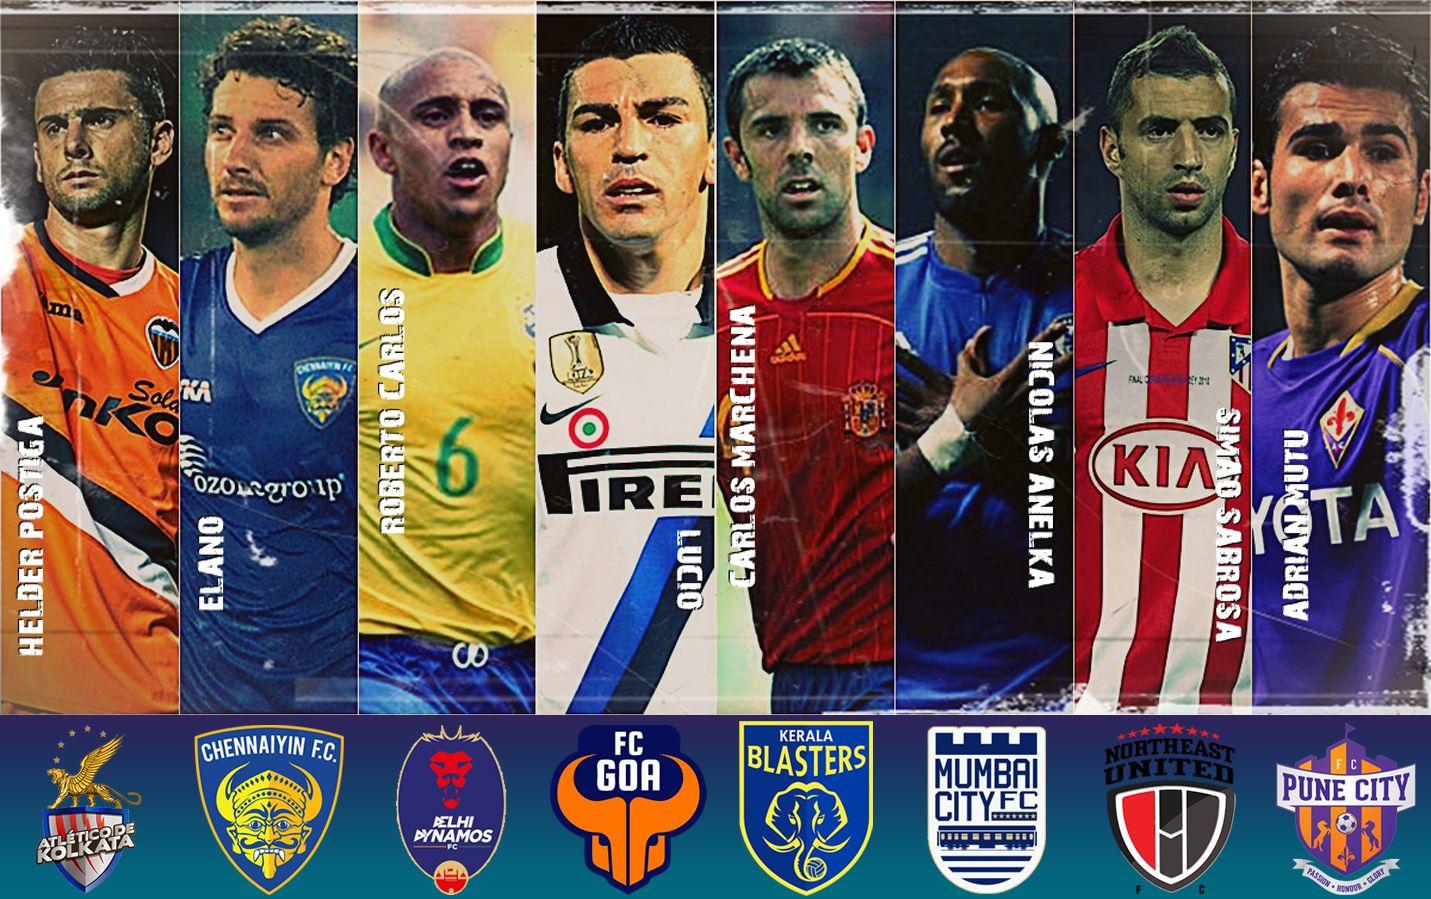 ISL 2015 (Indian super League) Live Streaming TV